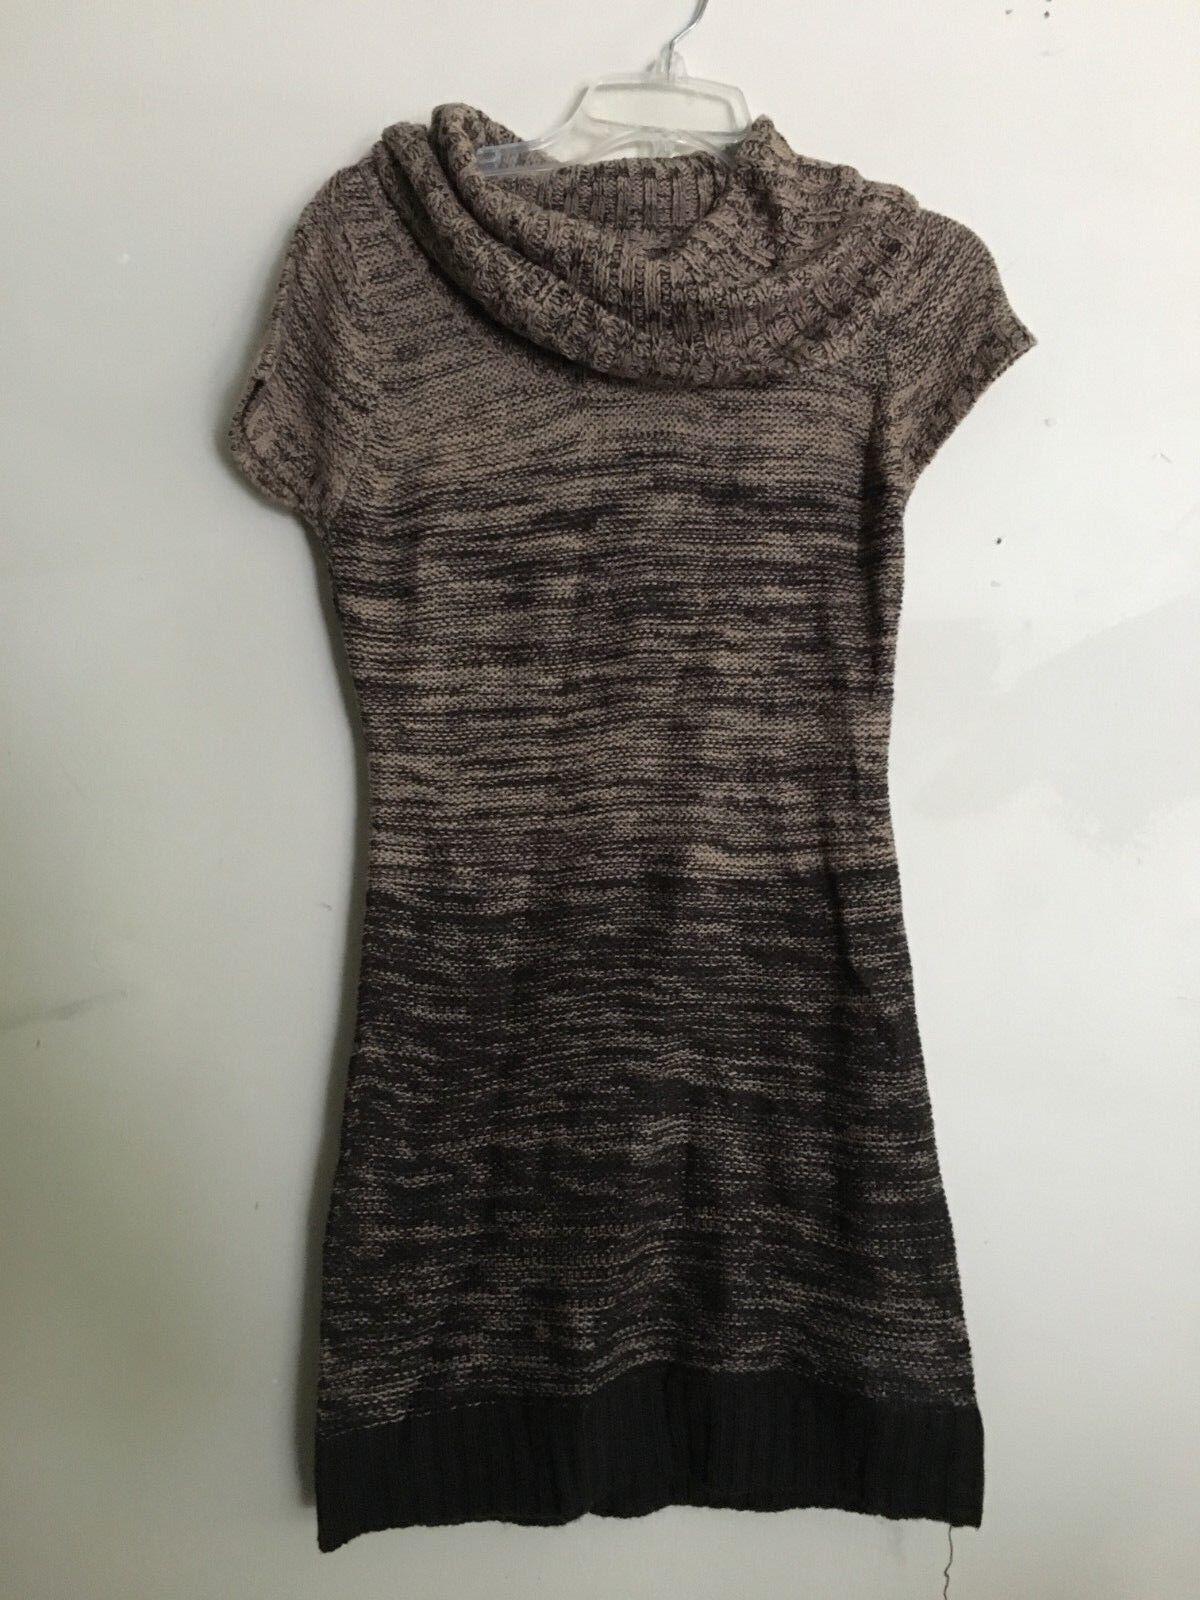 Lei Tan Dark Chocolate Stripe Knit Short Sleeve Sweater Sleeve Women Size M